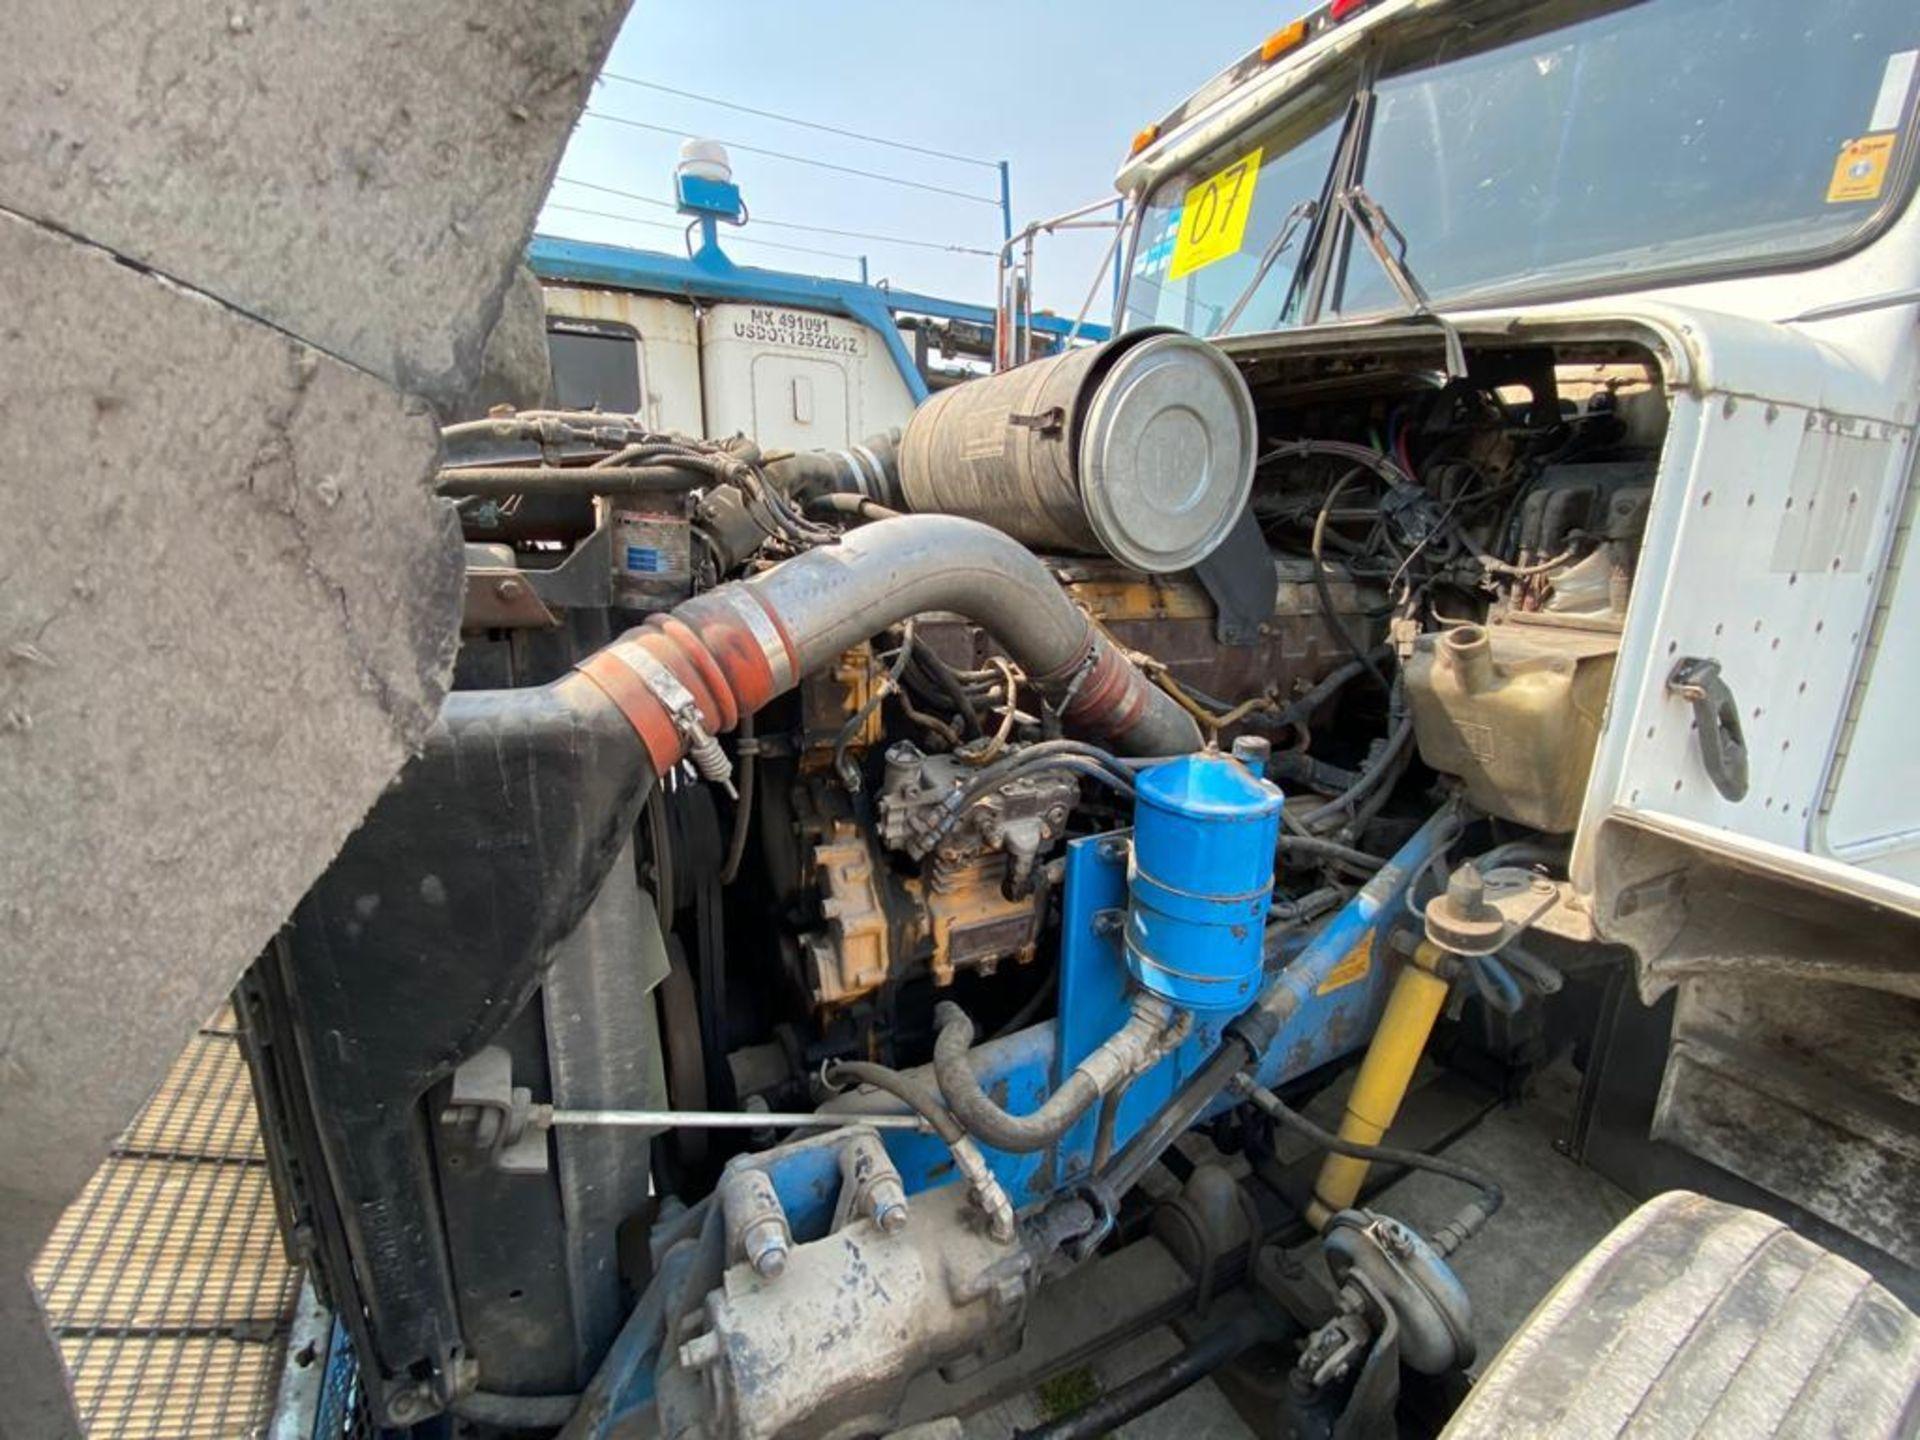 1999 Kenworth Sleeper truck tractor, standard transmission of 18 speeds - Image 54 of 72